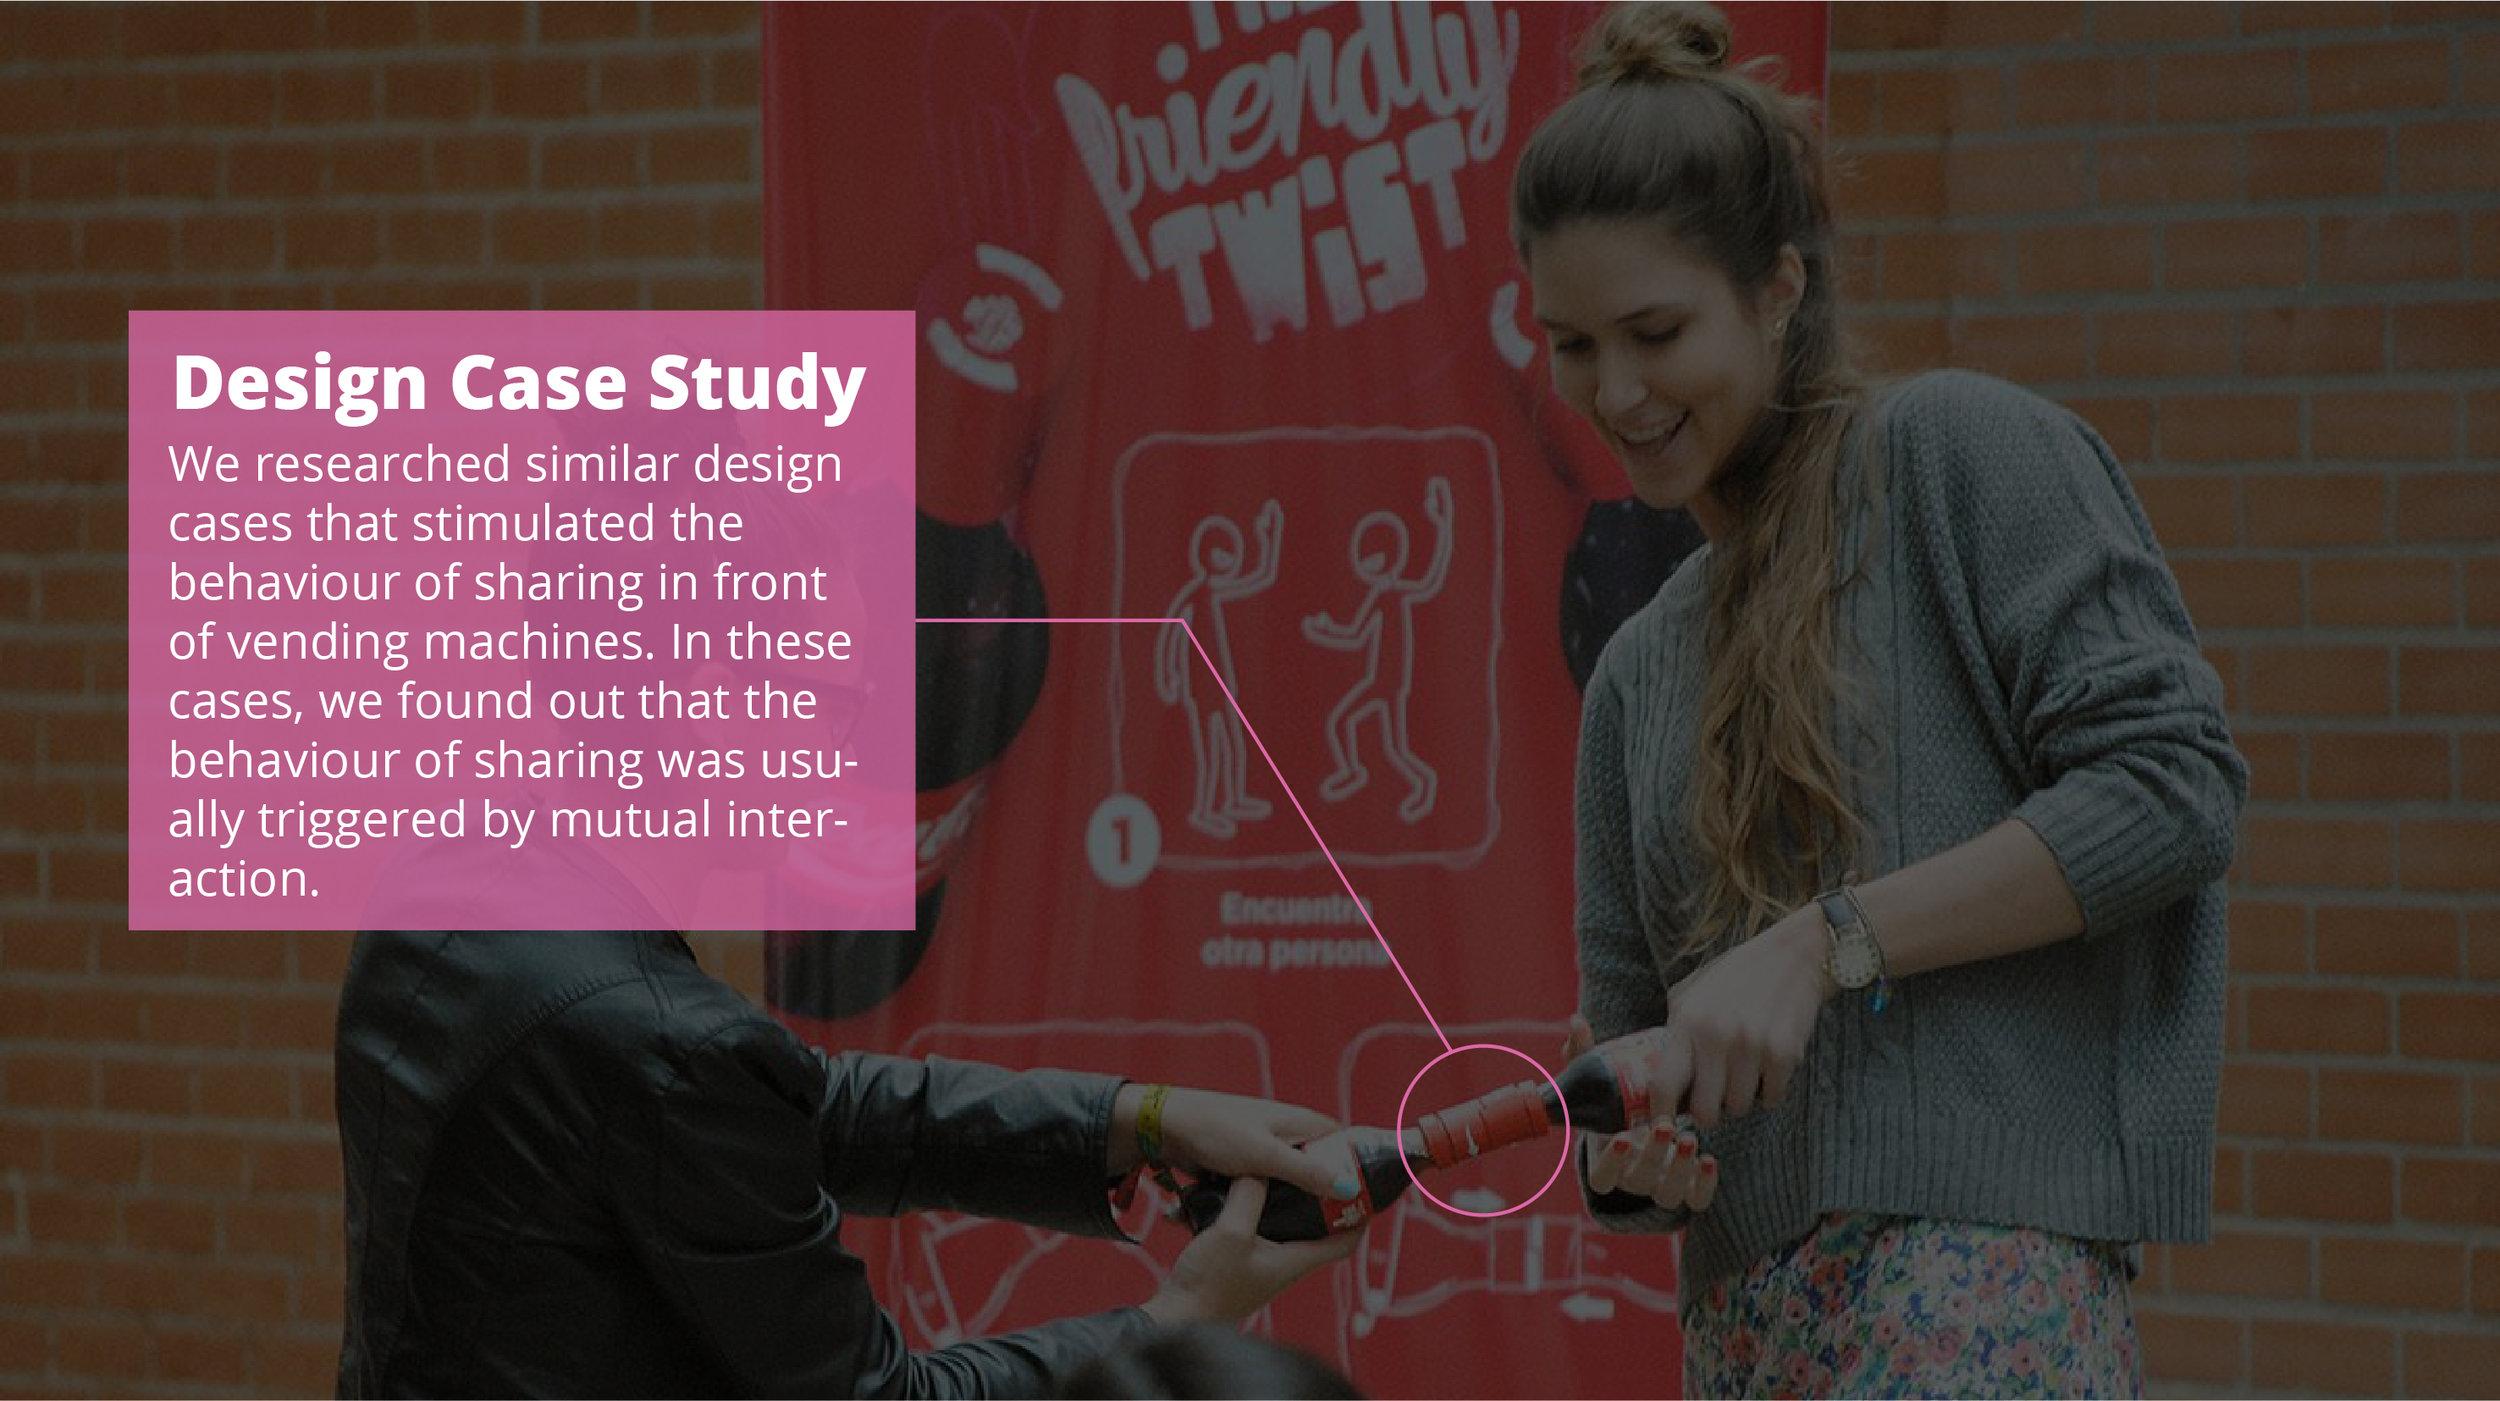 constructive design research-06.jpg